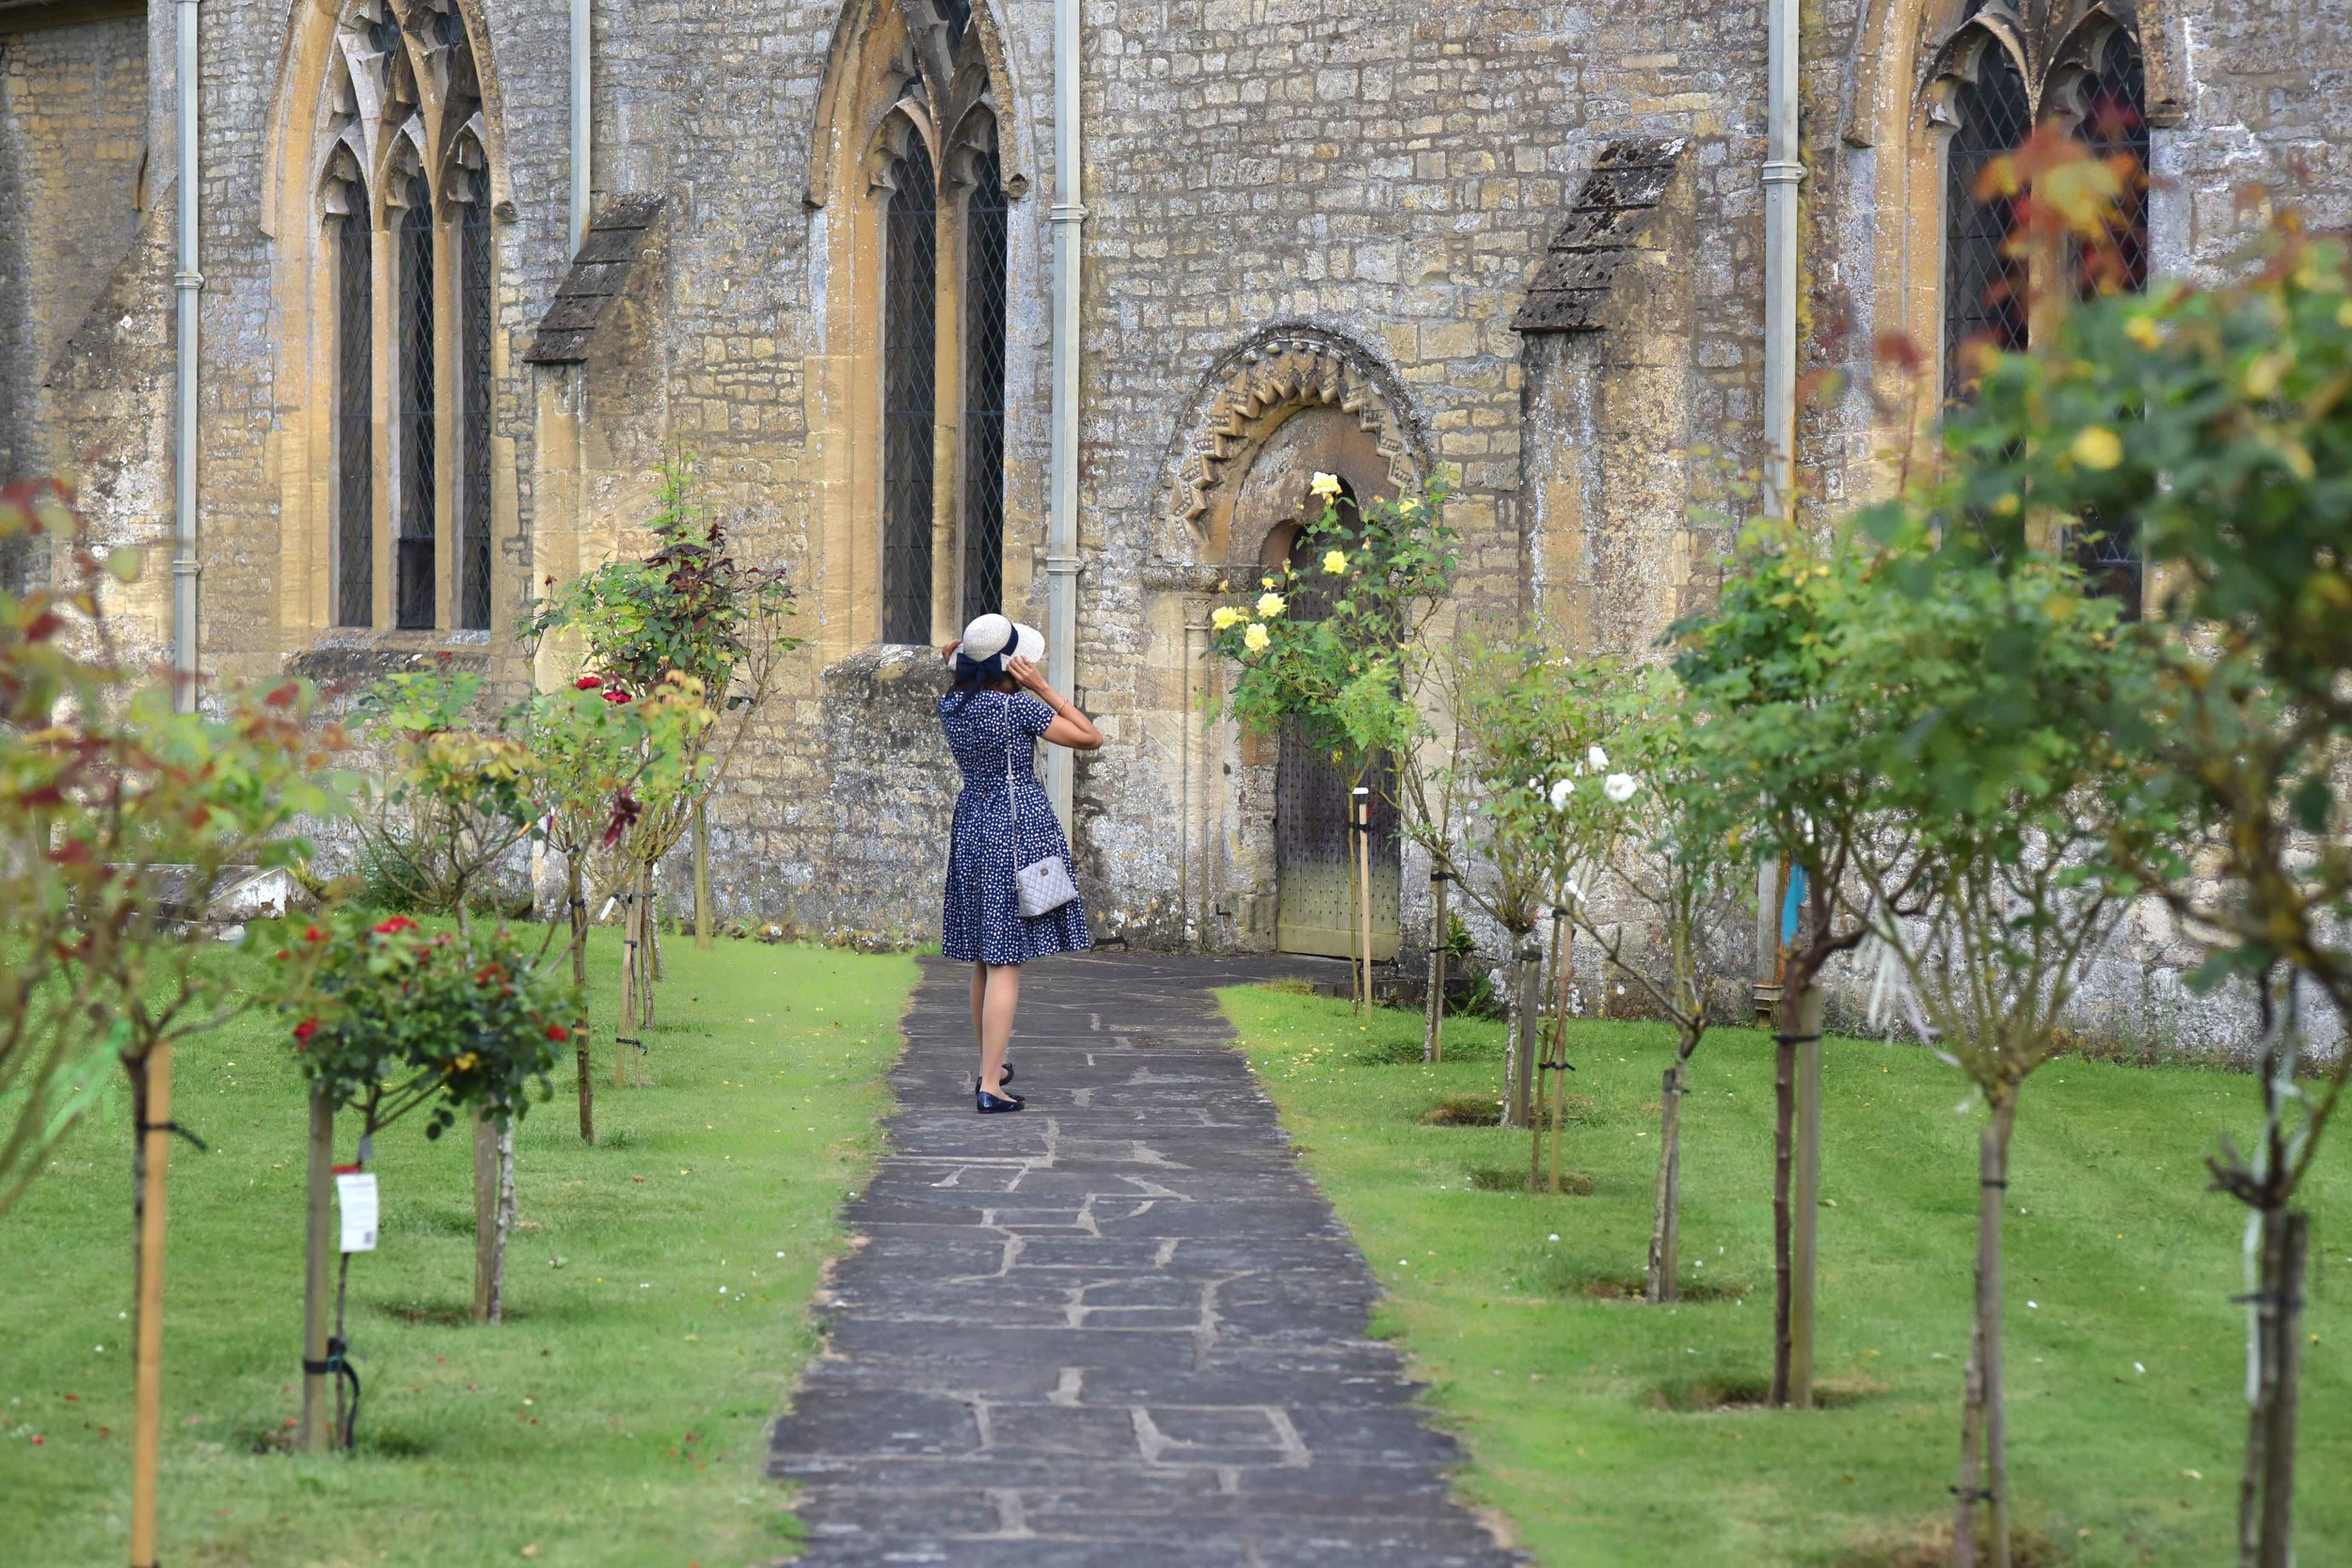 Saint Mary's Church,Bibury,Cotswold, England. Image©thingstodot.com